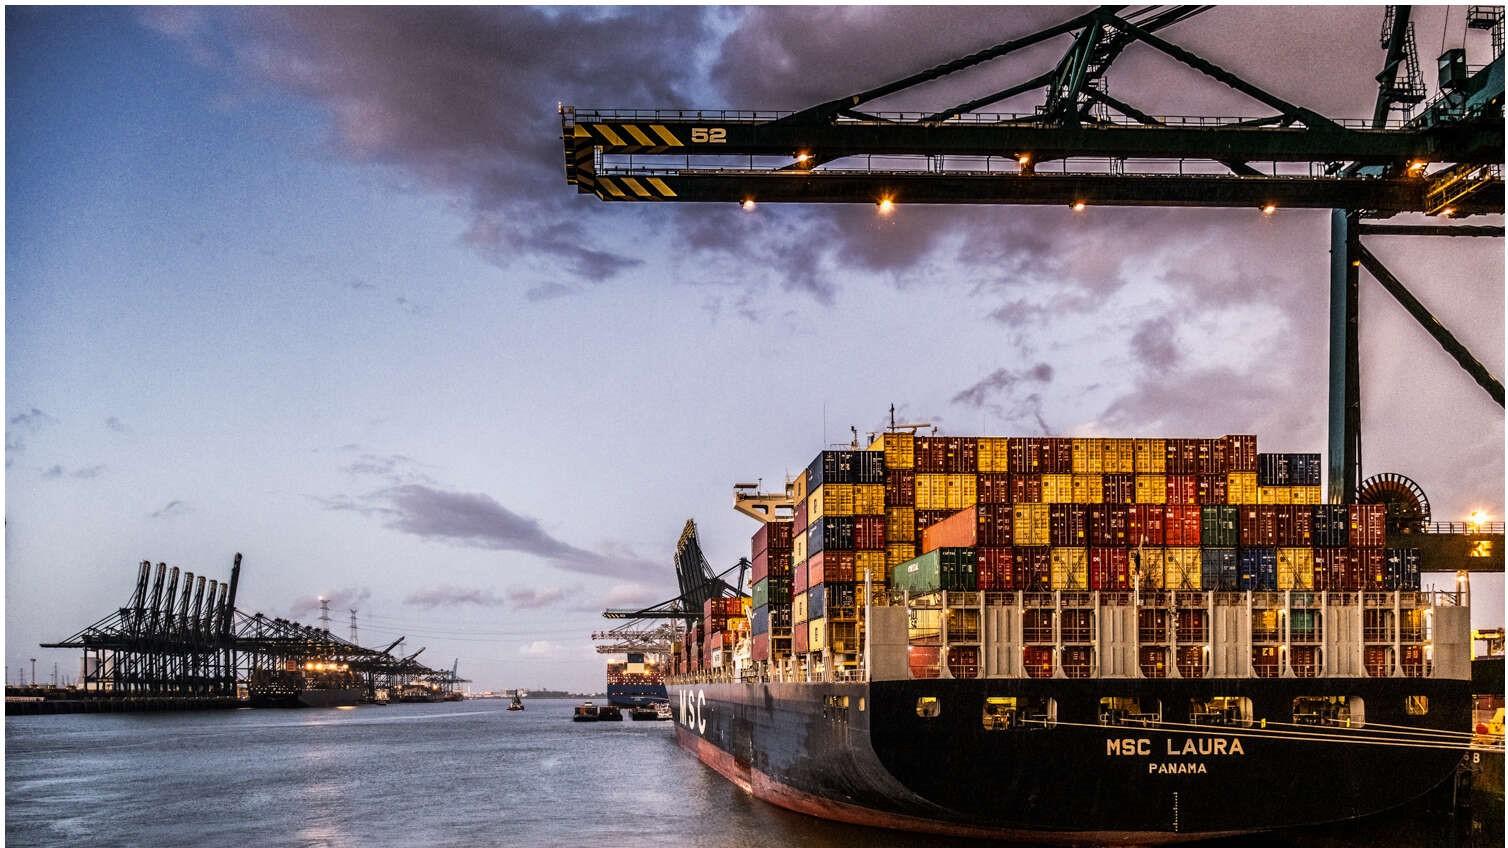 Port of Antwerp hold its own amongst corona crisis 1